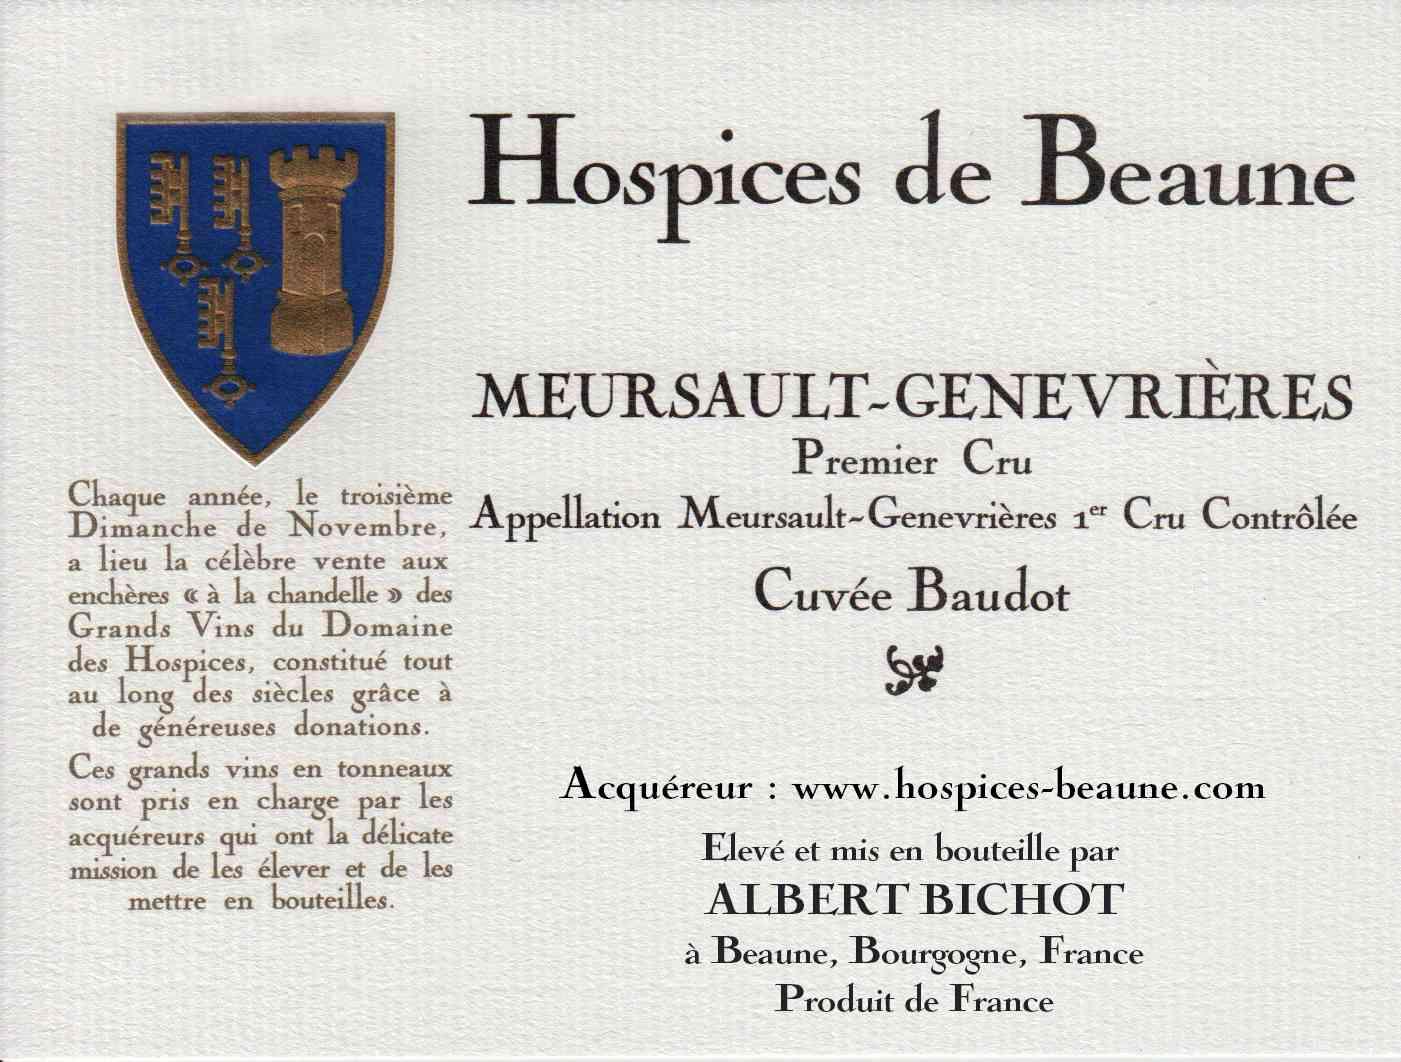 Encheres-auction-HospicesdeBeaune-AlbertBichot-Meursault-Genevrieres-PremierCru-Cuvee-Baudot